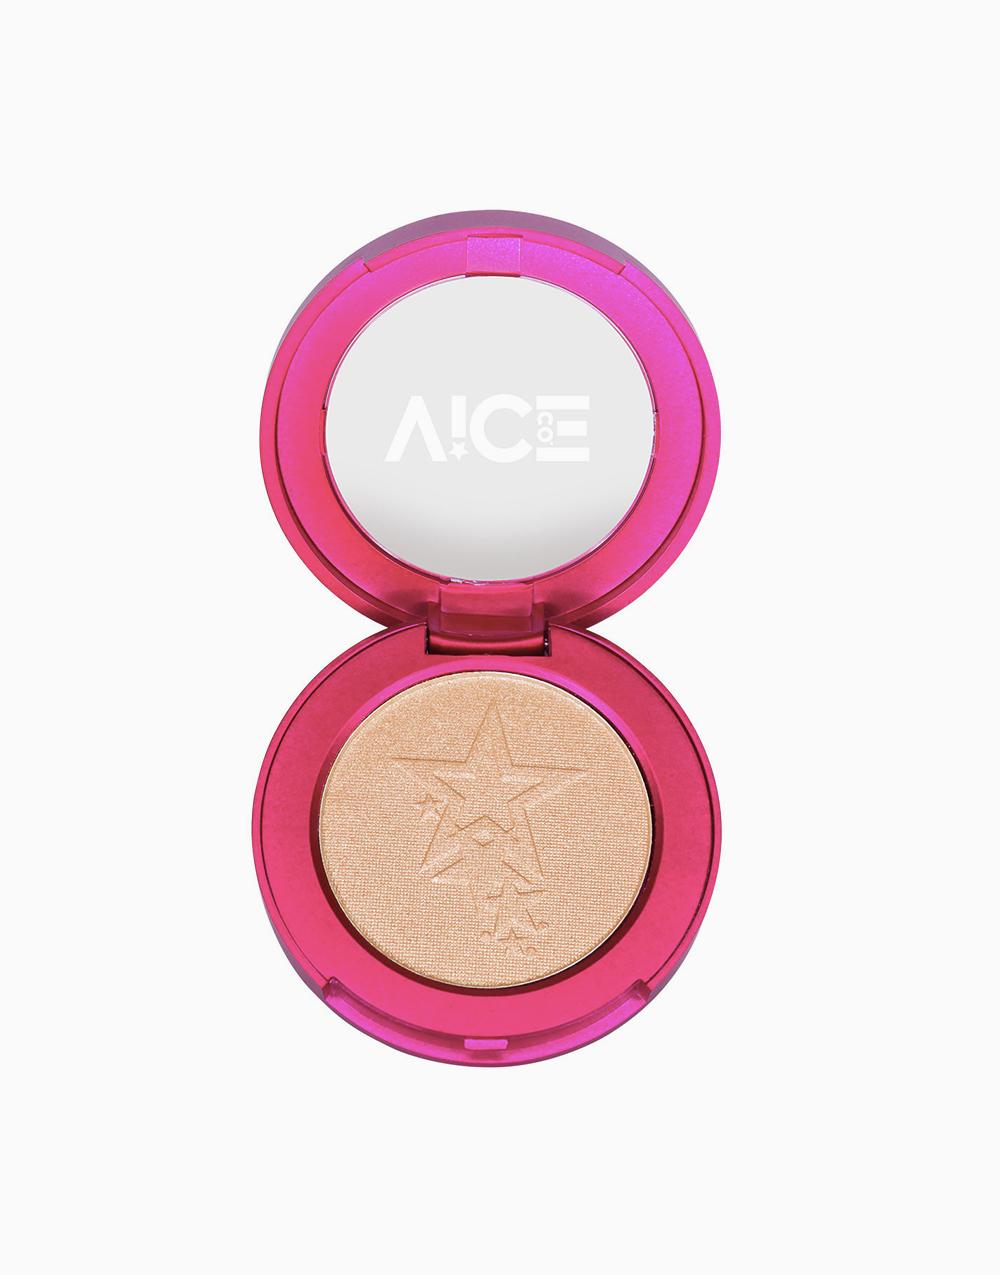 Aura Glow (3.5g) by Vice Cosmetics | Shining